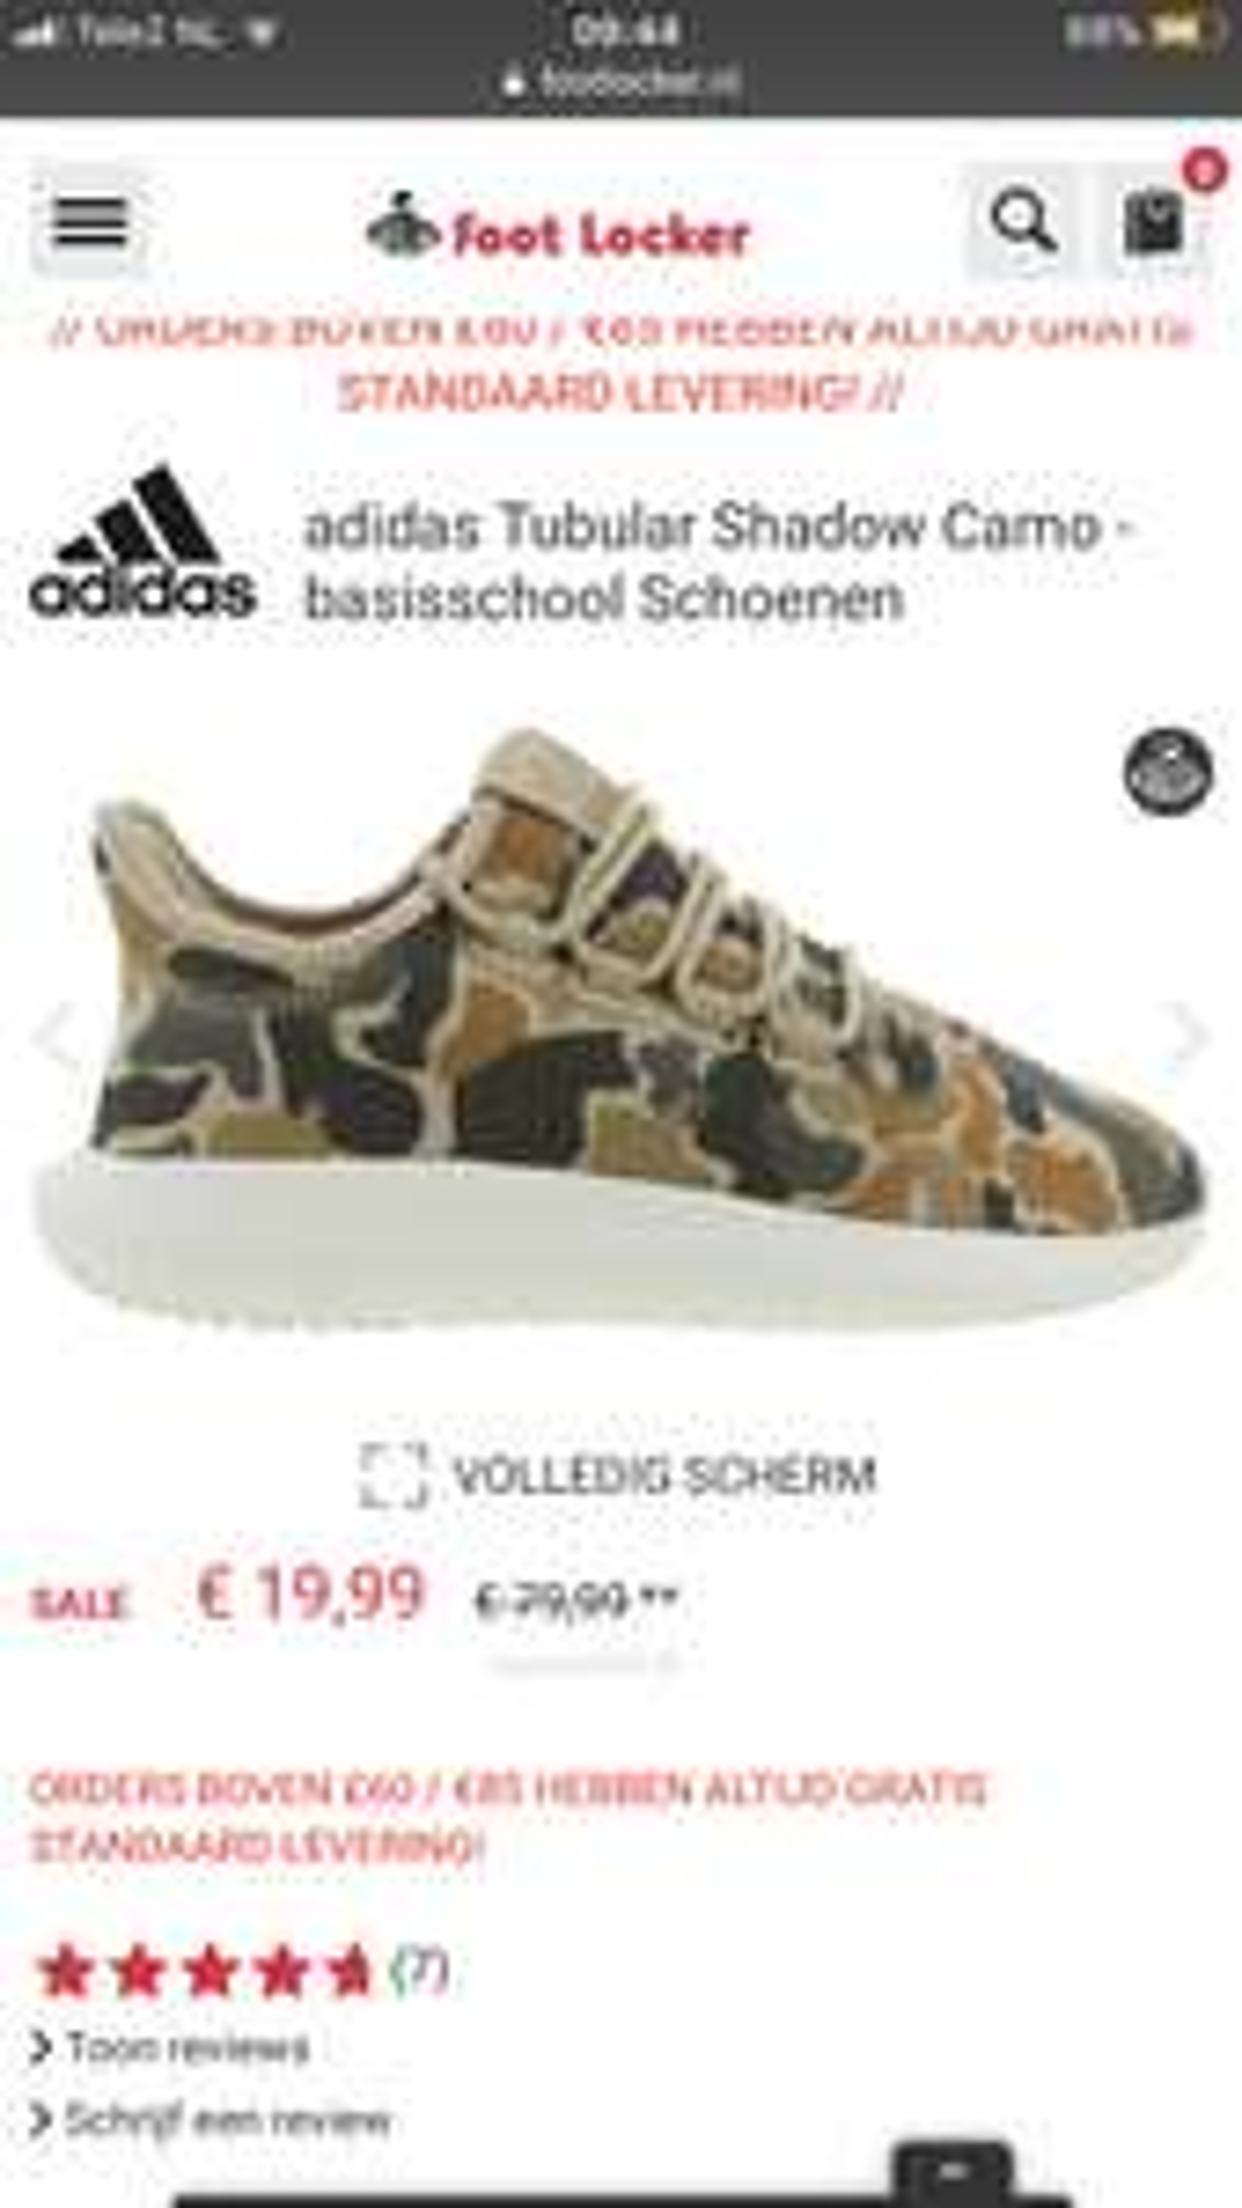 Adidas Tubular kids 19,99 @ footlocker